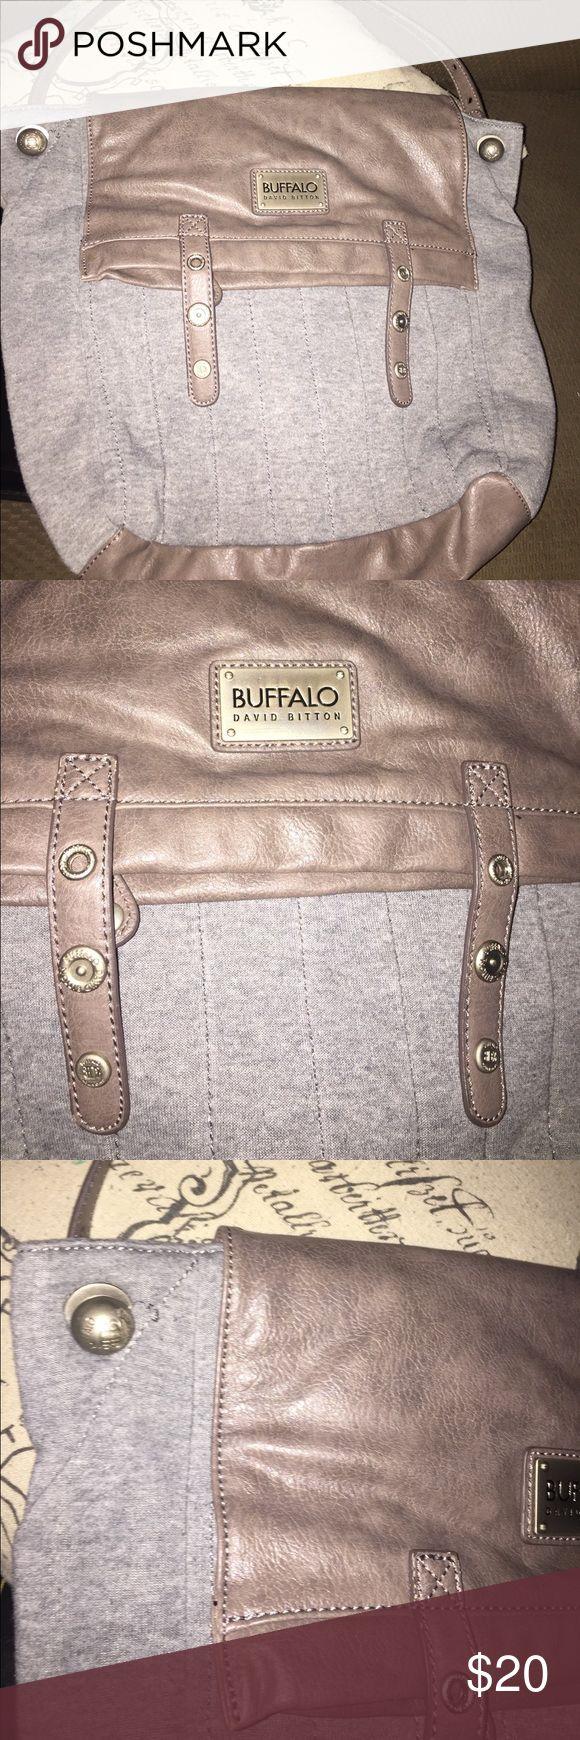 "Buffalo David Bitton satchel bag Buffalo David Bitton satchel bag, grey knit, vegan leather, nickel hardware. 12"" x  12"" Buffalo David Bitton Bags Satchels"